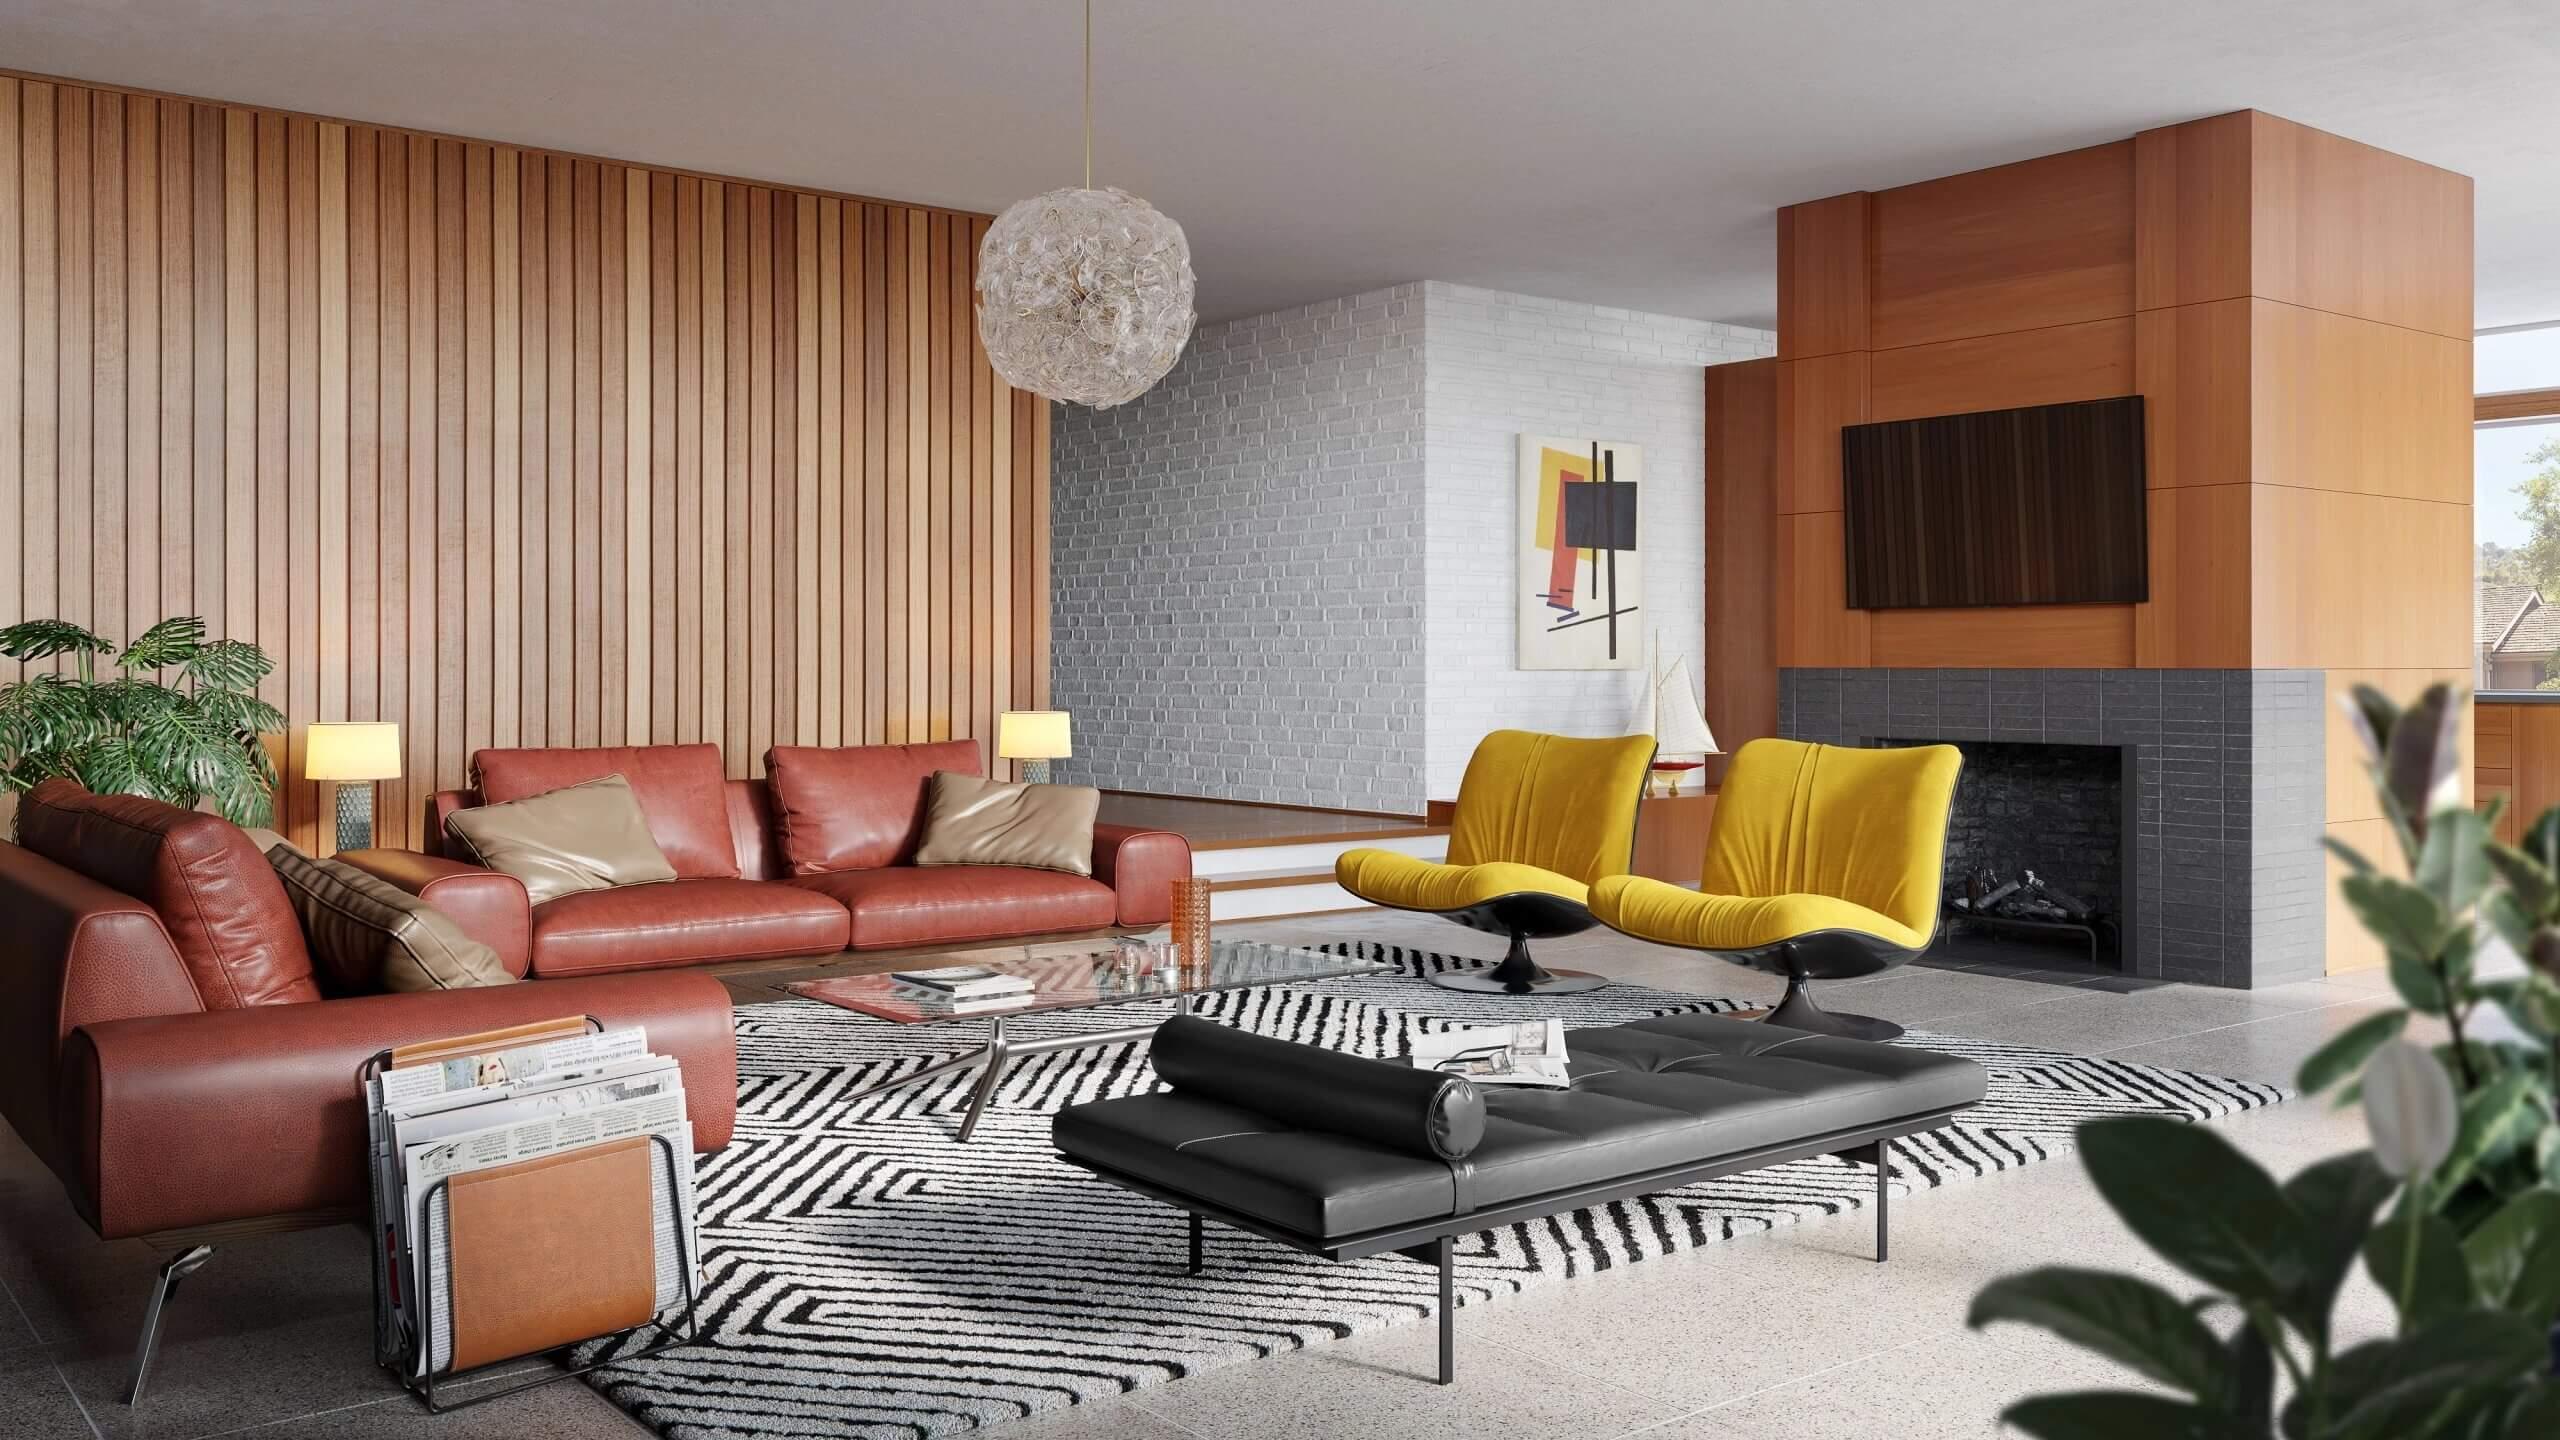 A 3D Render of a Living Room